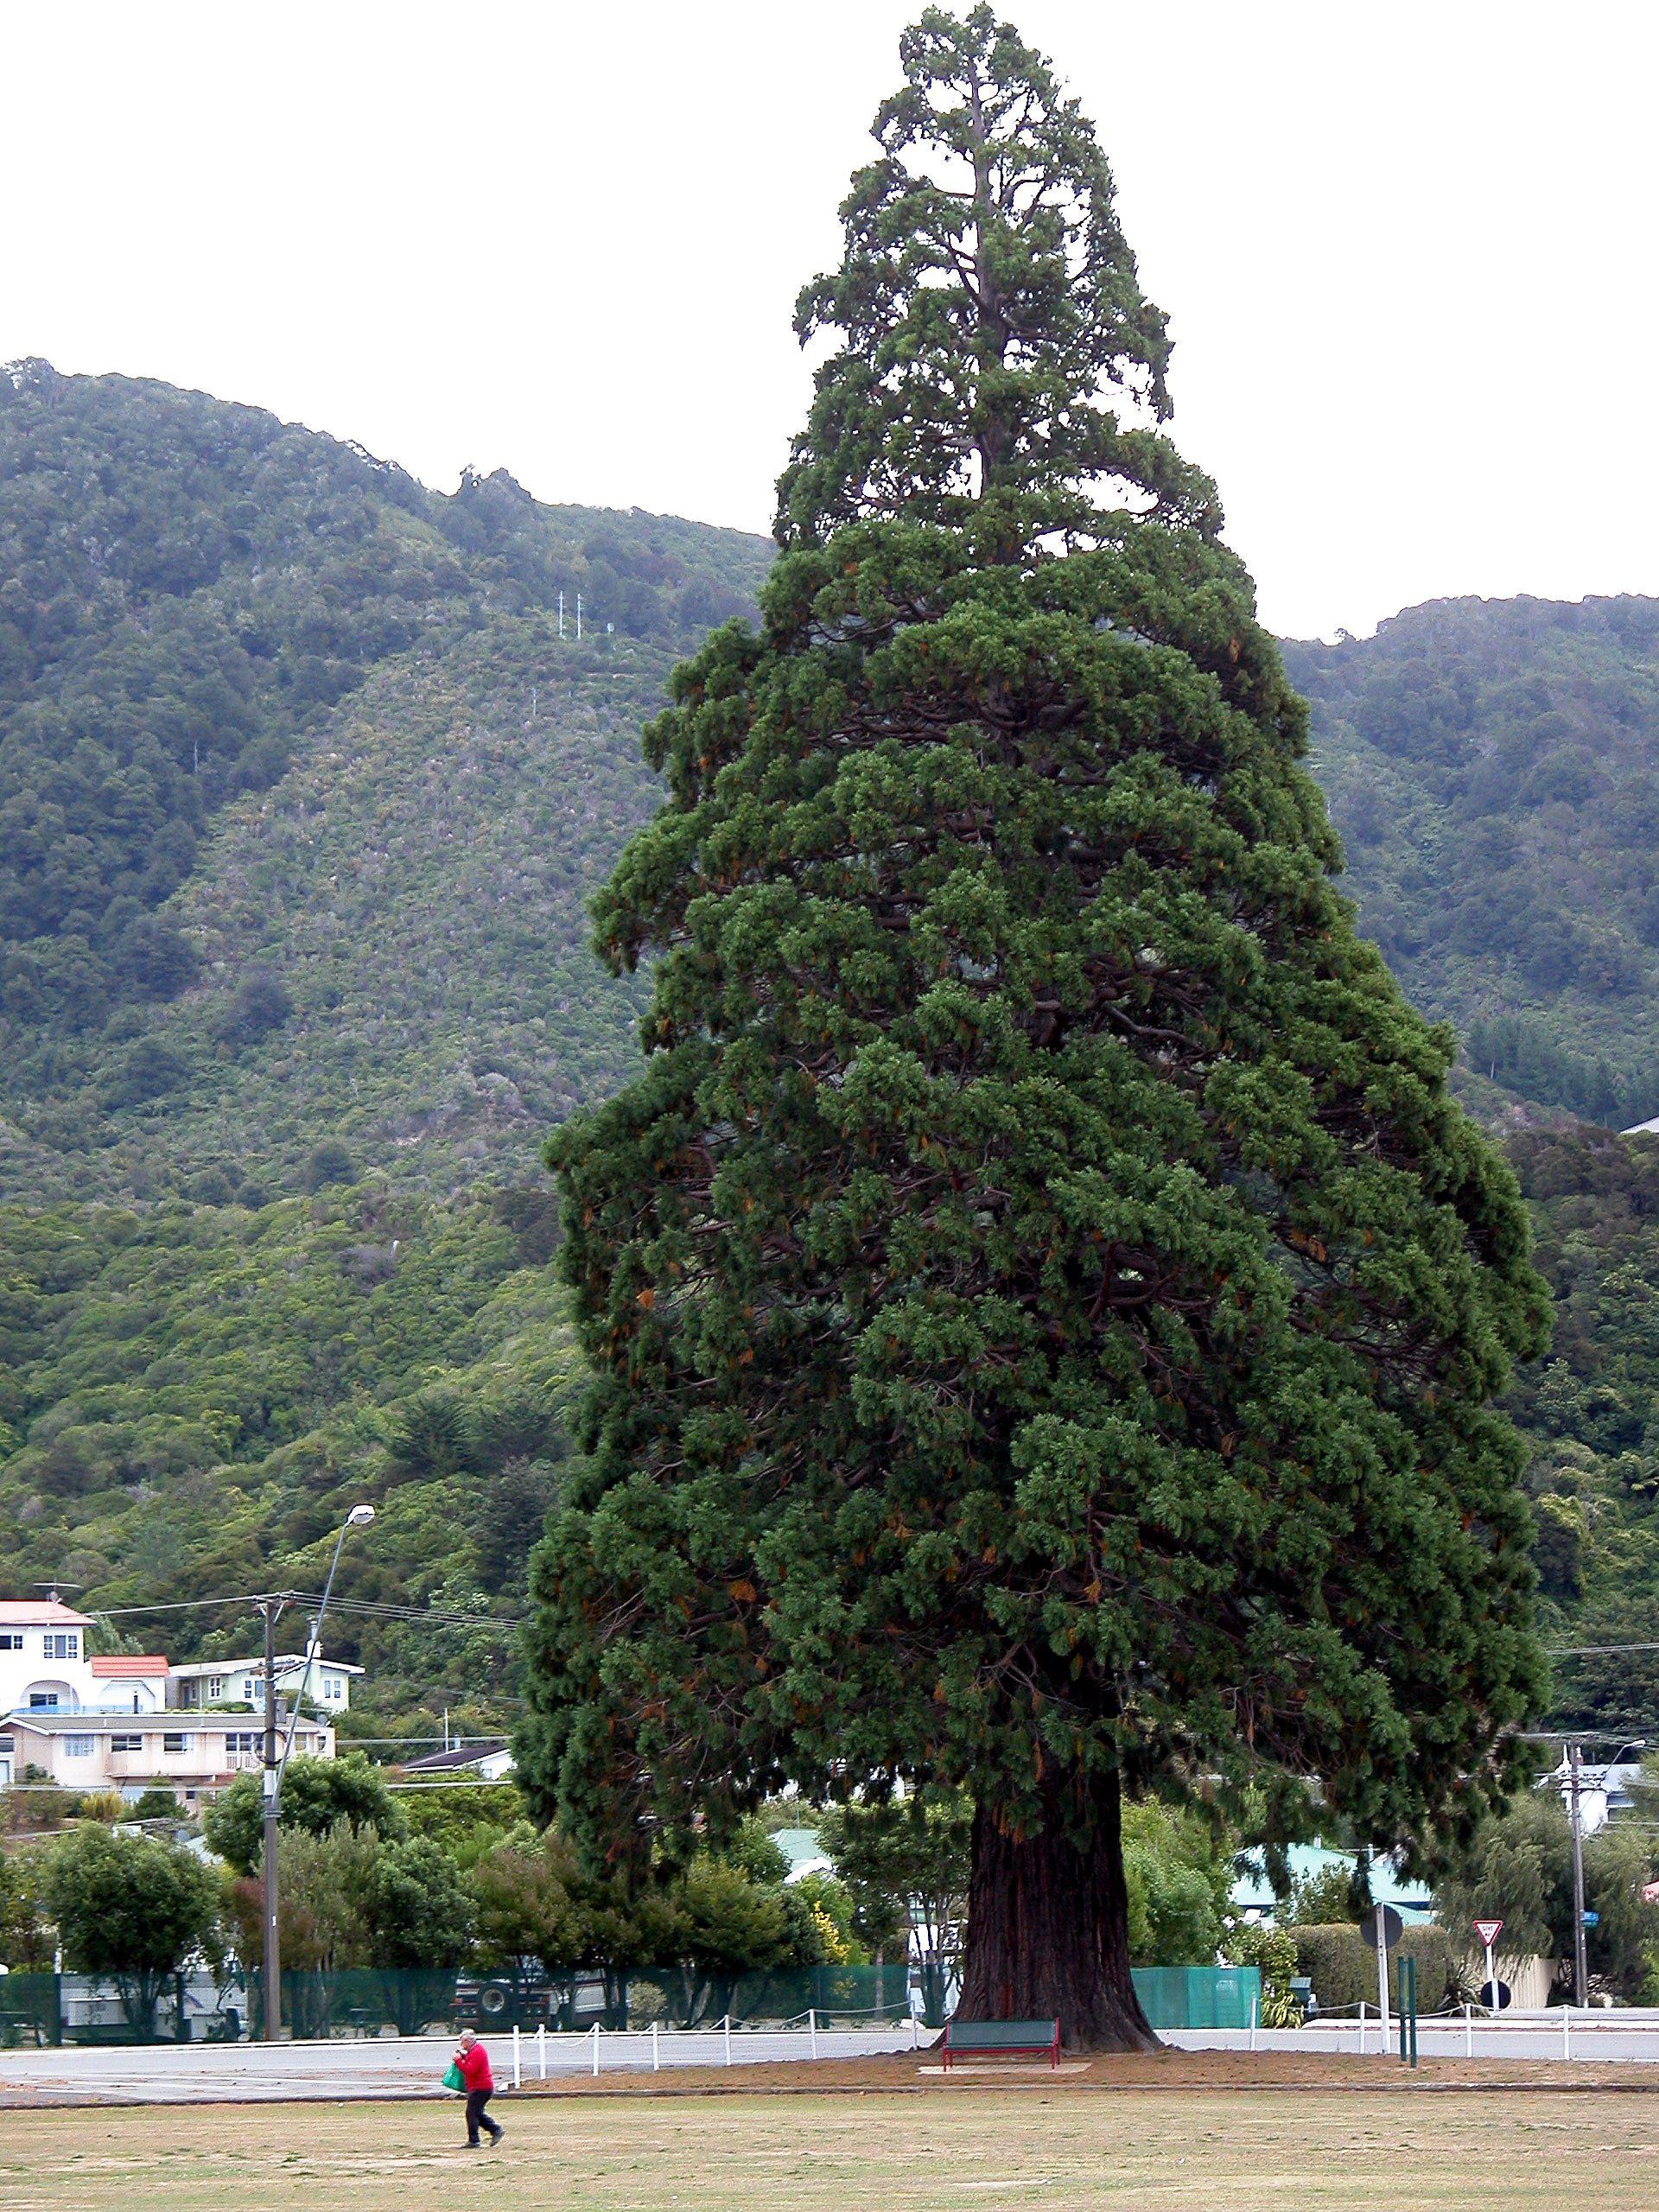 Giant Sequoia Sierra Redwood Or Wellingtonia Sequoiadendron Giganteum Tree Beautiful Tree Tree Sequoiadendron Giganteum